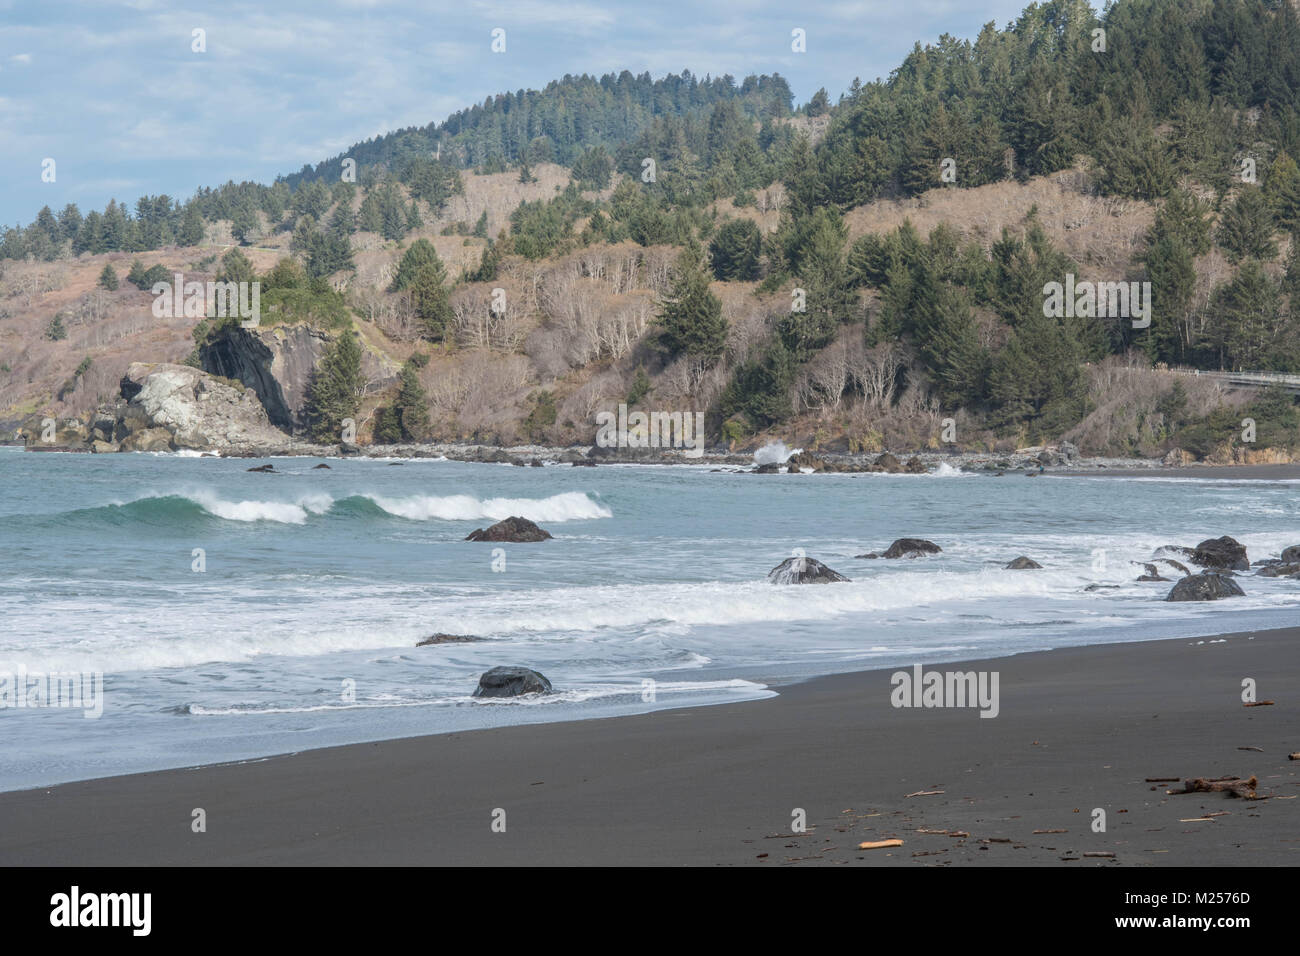 tranquil calming ocean scene - Stock Image